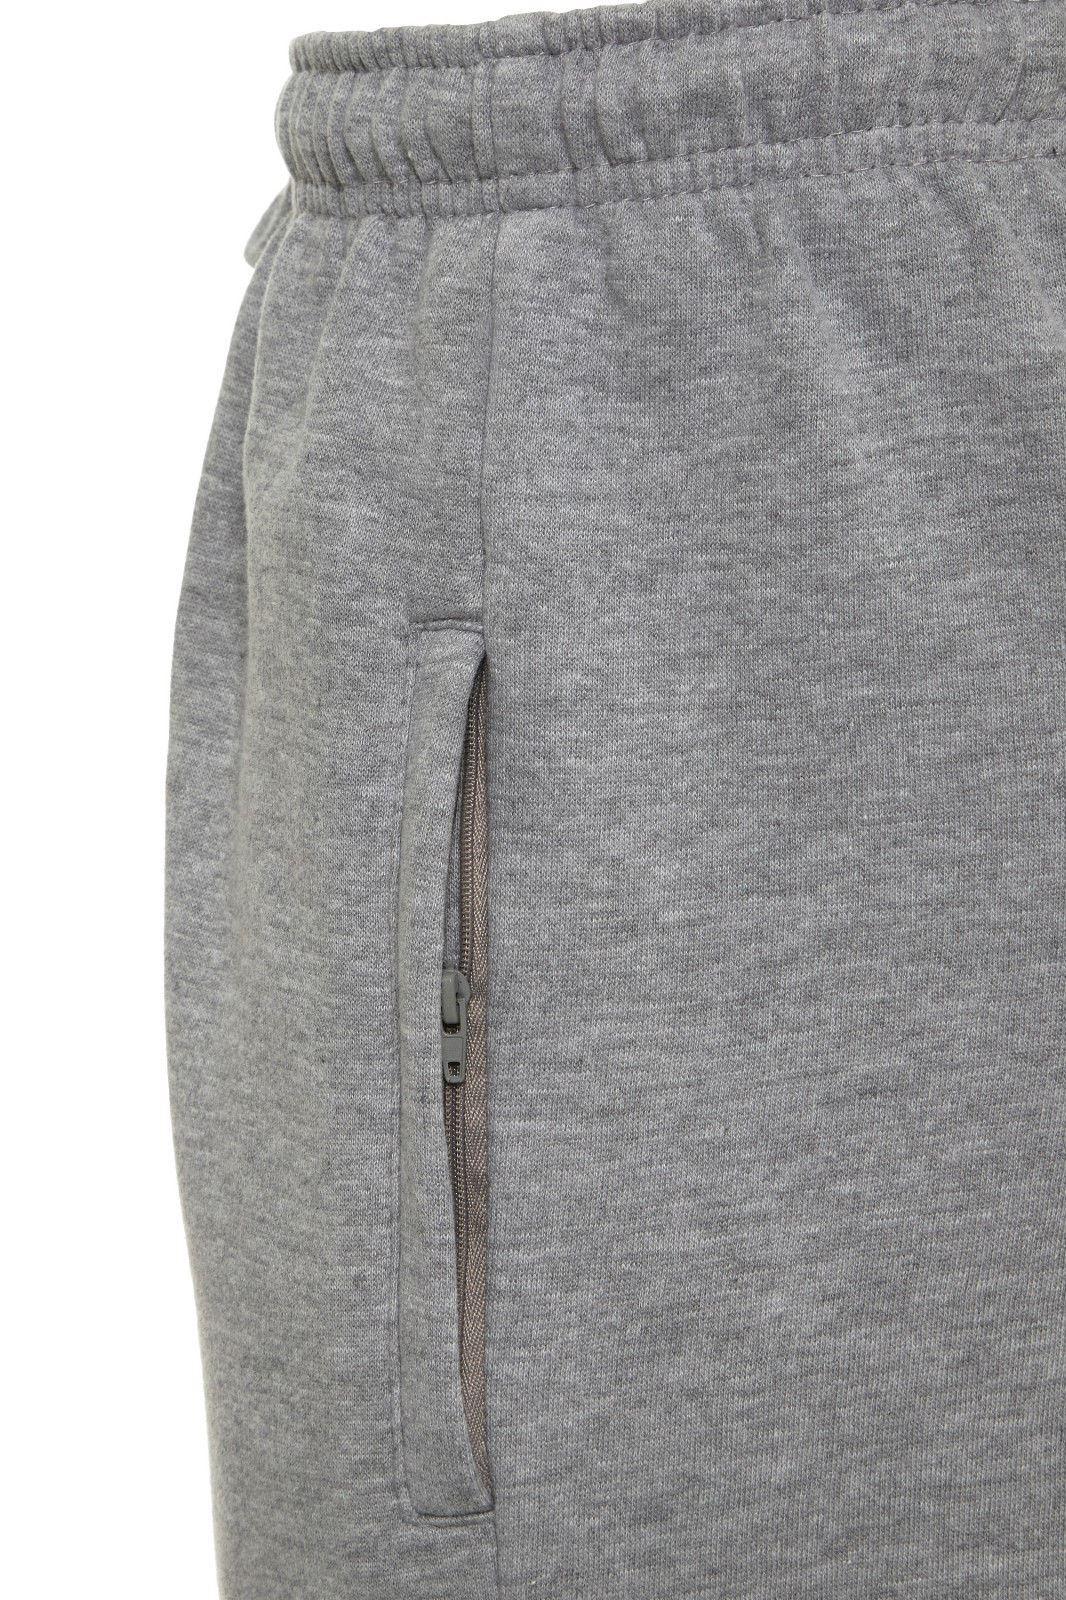 Uomo-Casual-Tinta-Unita-Pantaloni-sportivi-Bottoms-Apri-Hem-Sudore-Pantaloni-Tasche-Con-Zip miniatura 9